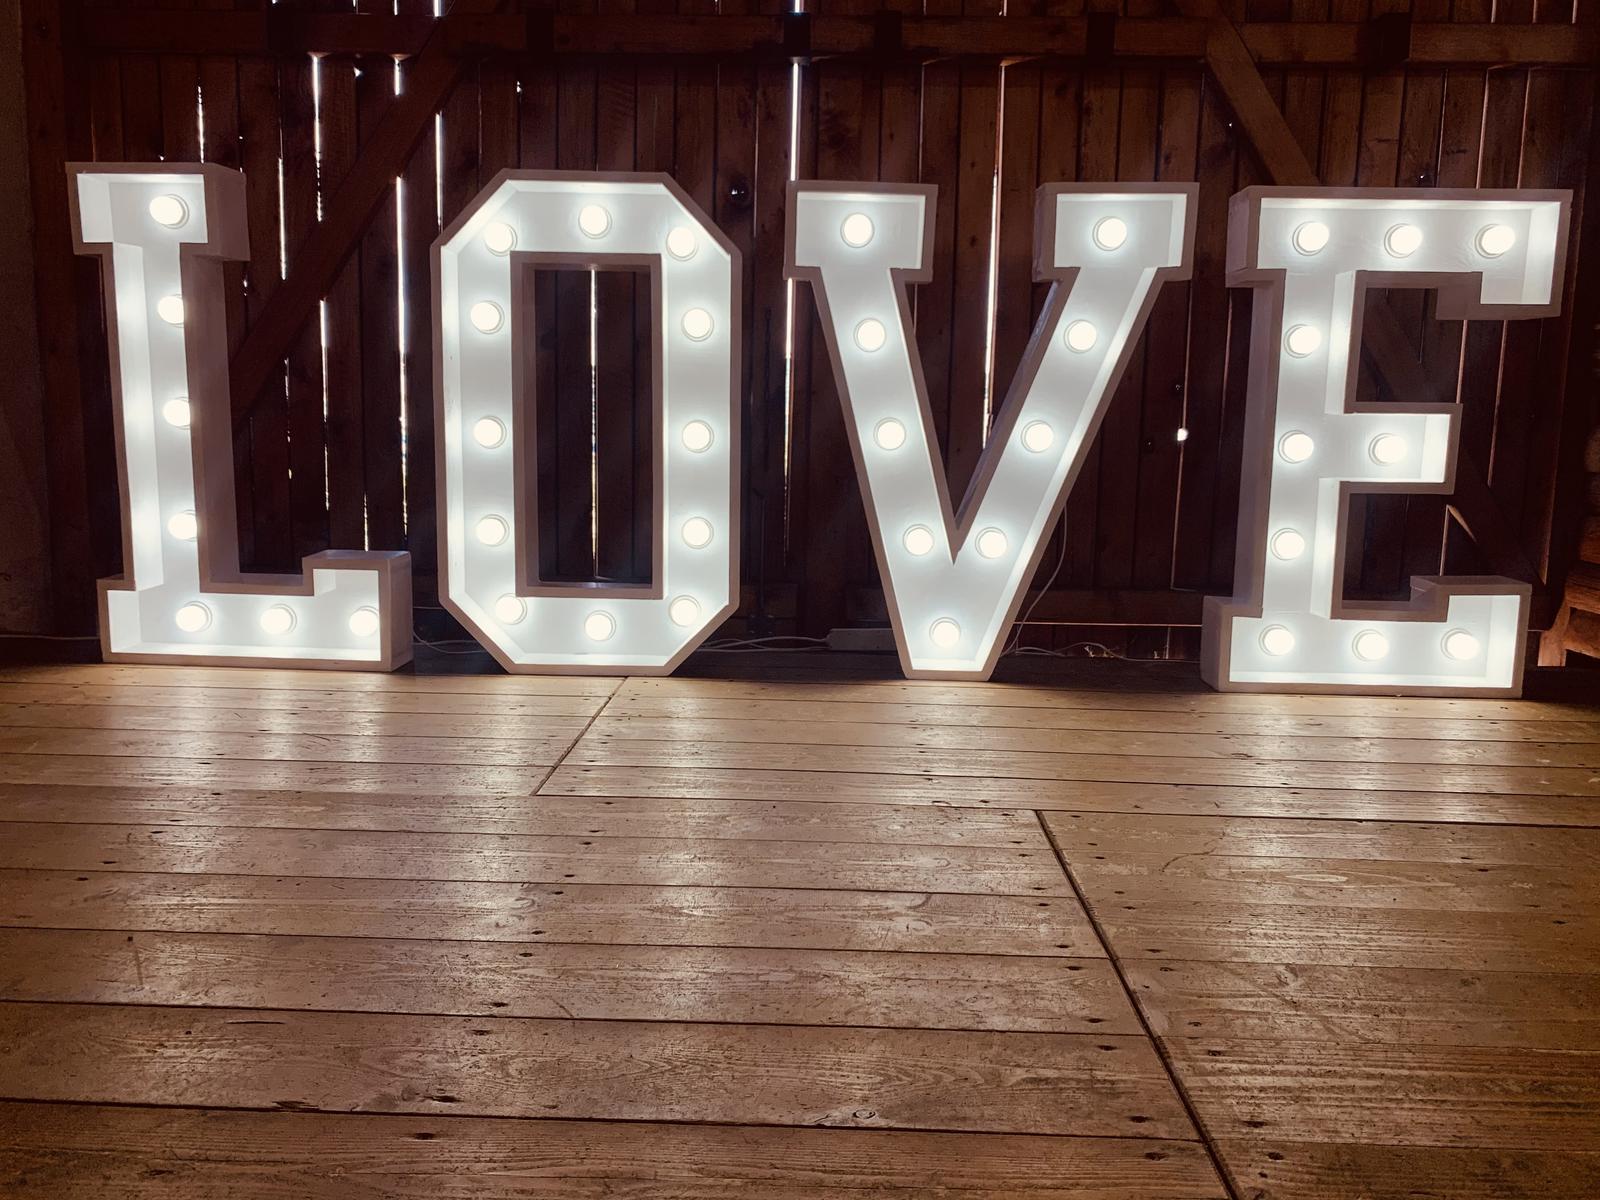 svetelné nápisy/písmena LOVE, MR&MRS - Obrázok č. 1